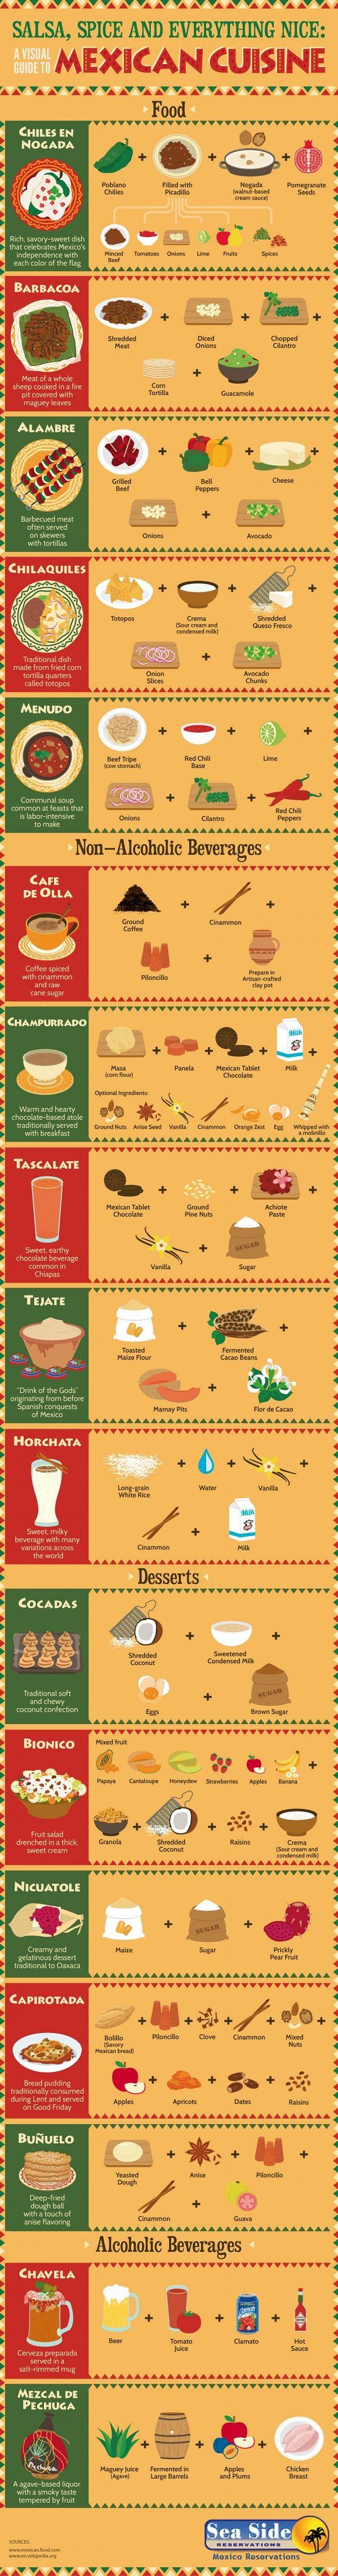 A Visual Guide To Mexican Cuisine - DesignTAXI.com Pretty close... but it isn't right at all... still it's cute :)